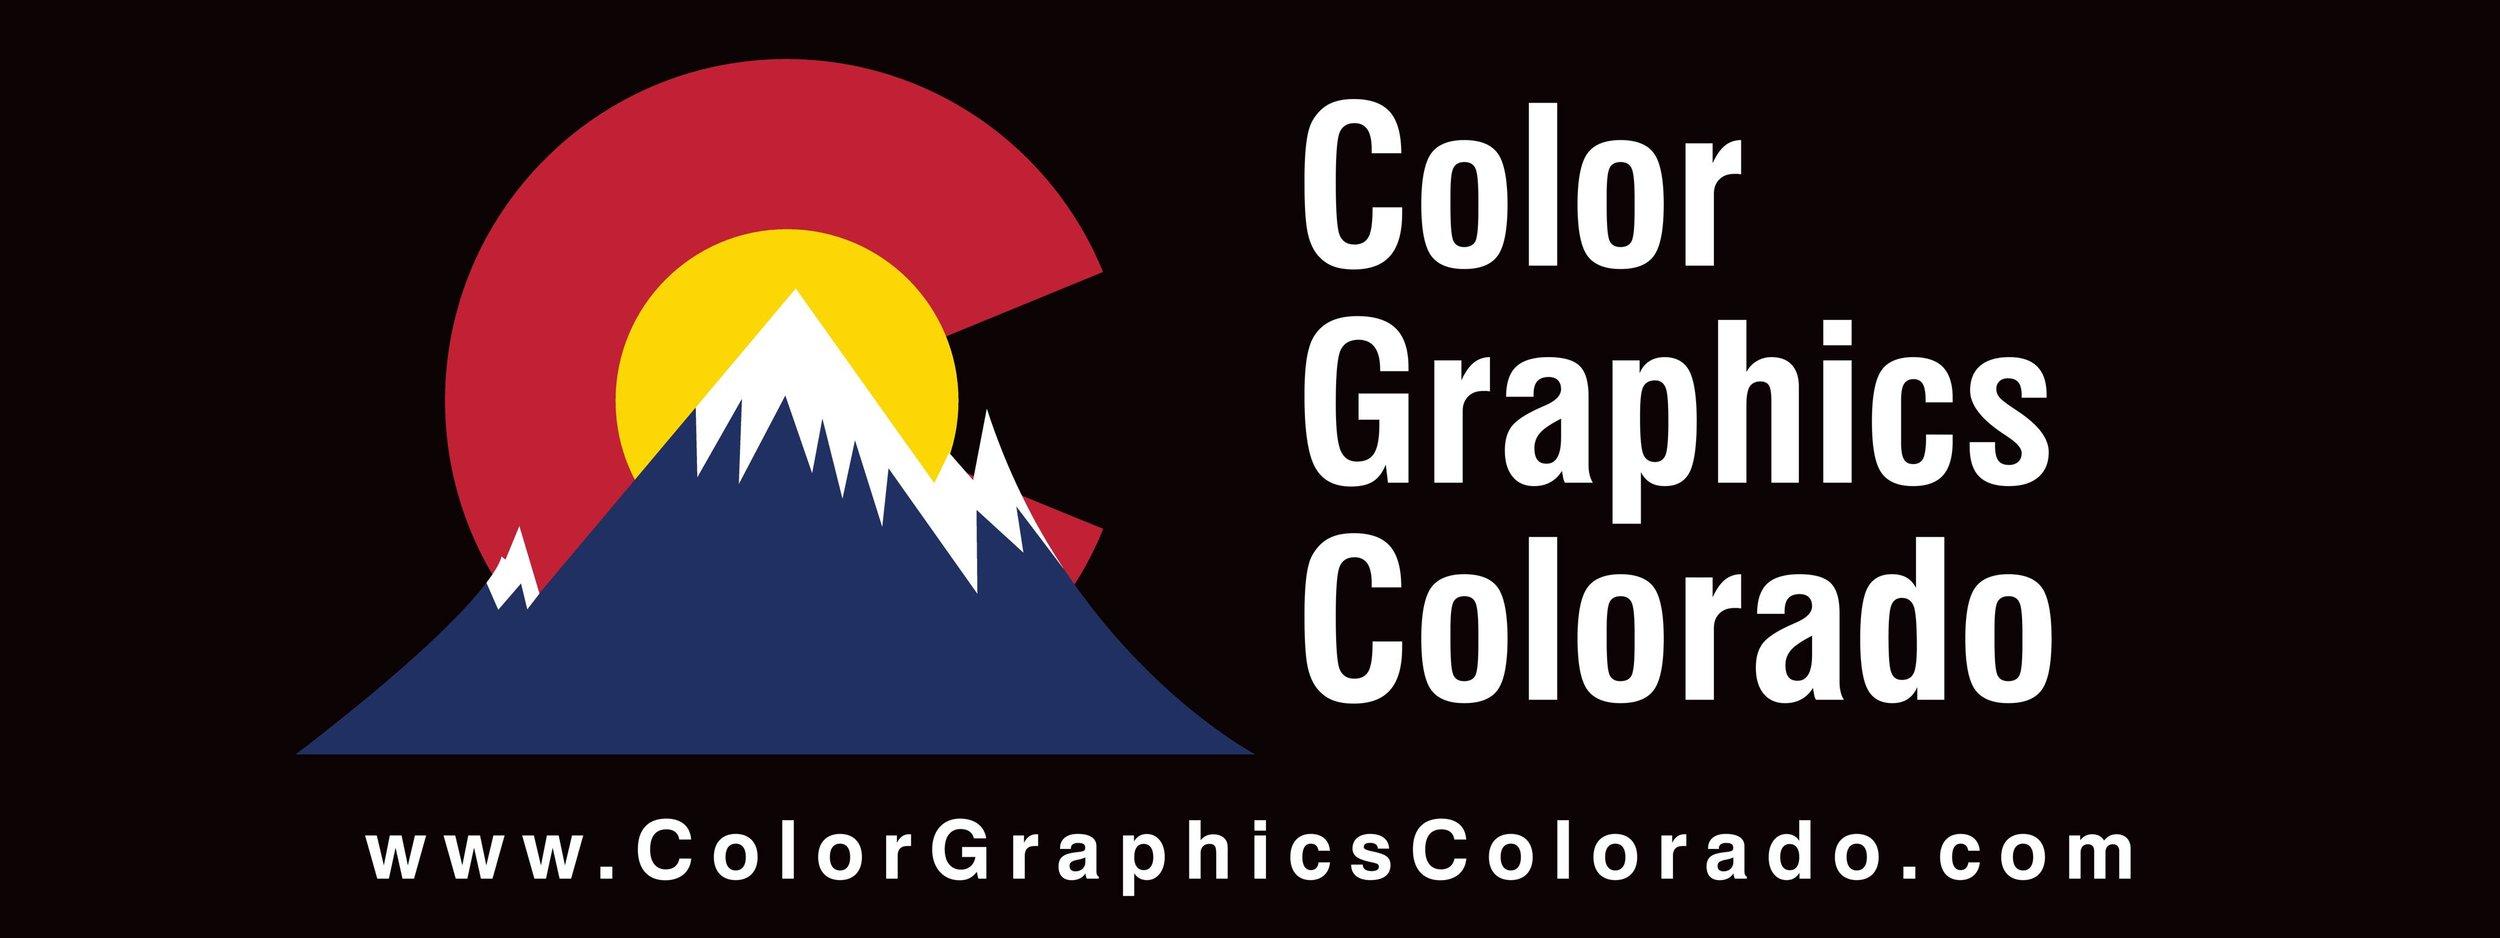 Color Graphics Colorado - 1708 E LINCOLN AVE UNIT 6FORT COLLINS, CO 80524(970) 673-6458http://colorgraphicscolorado.com*Discount available for members